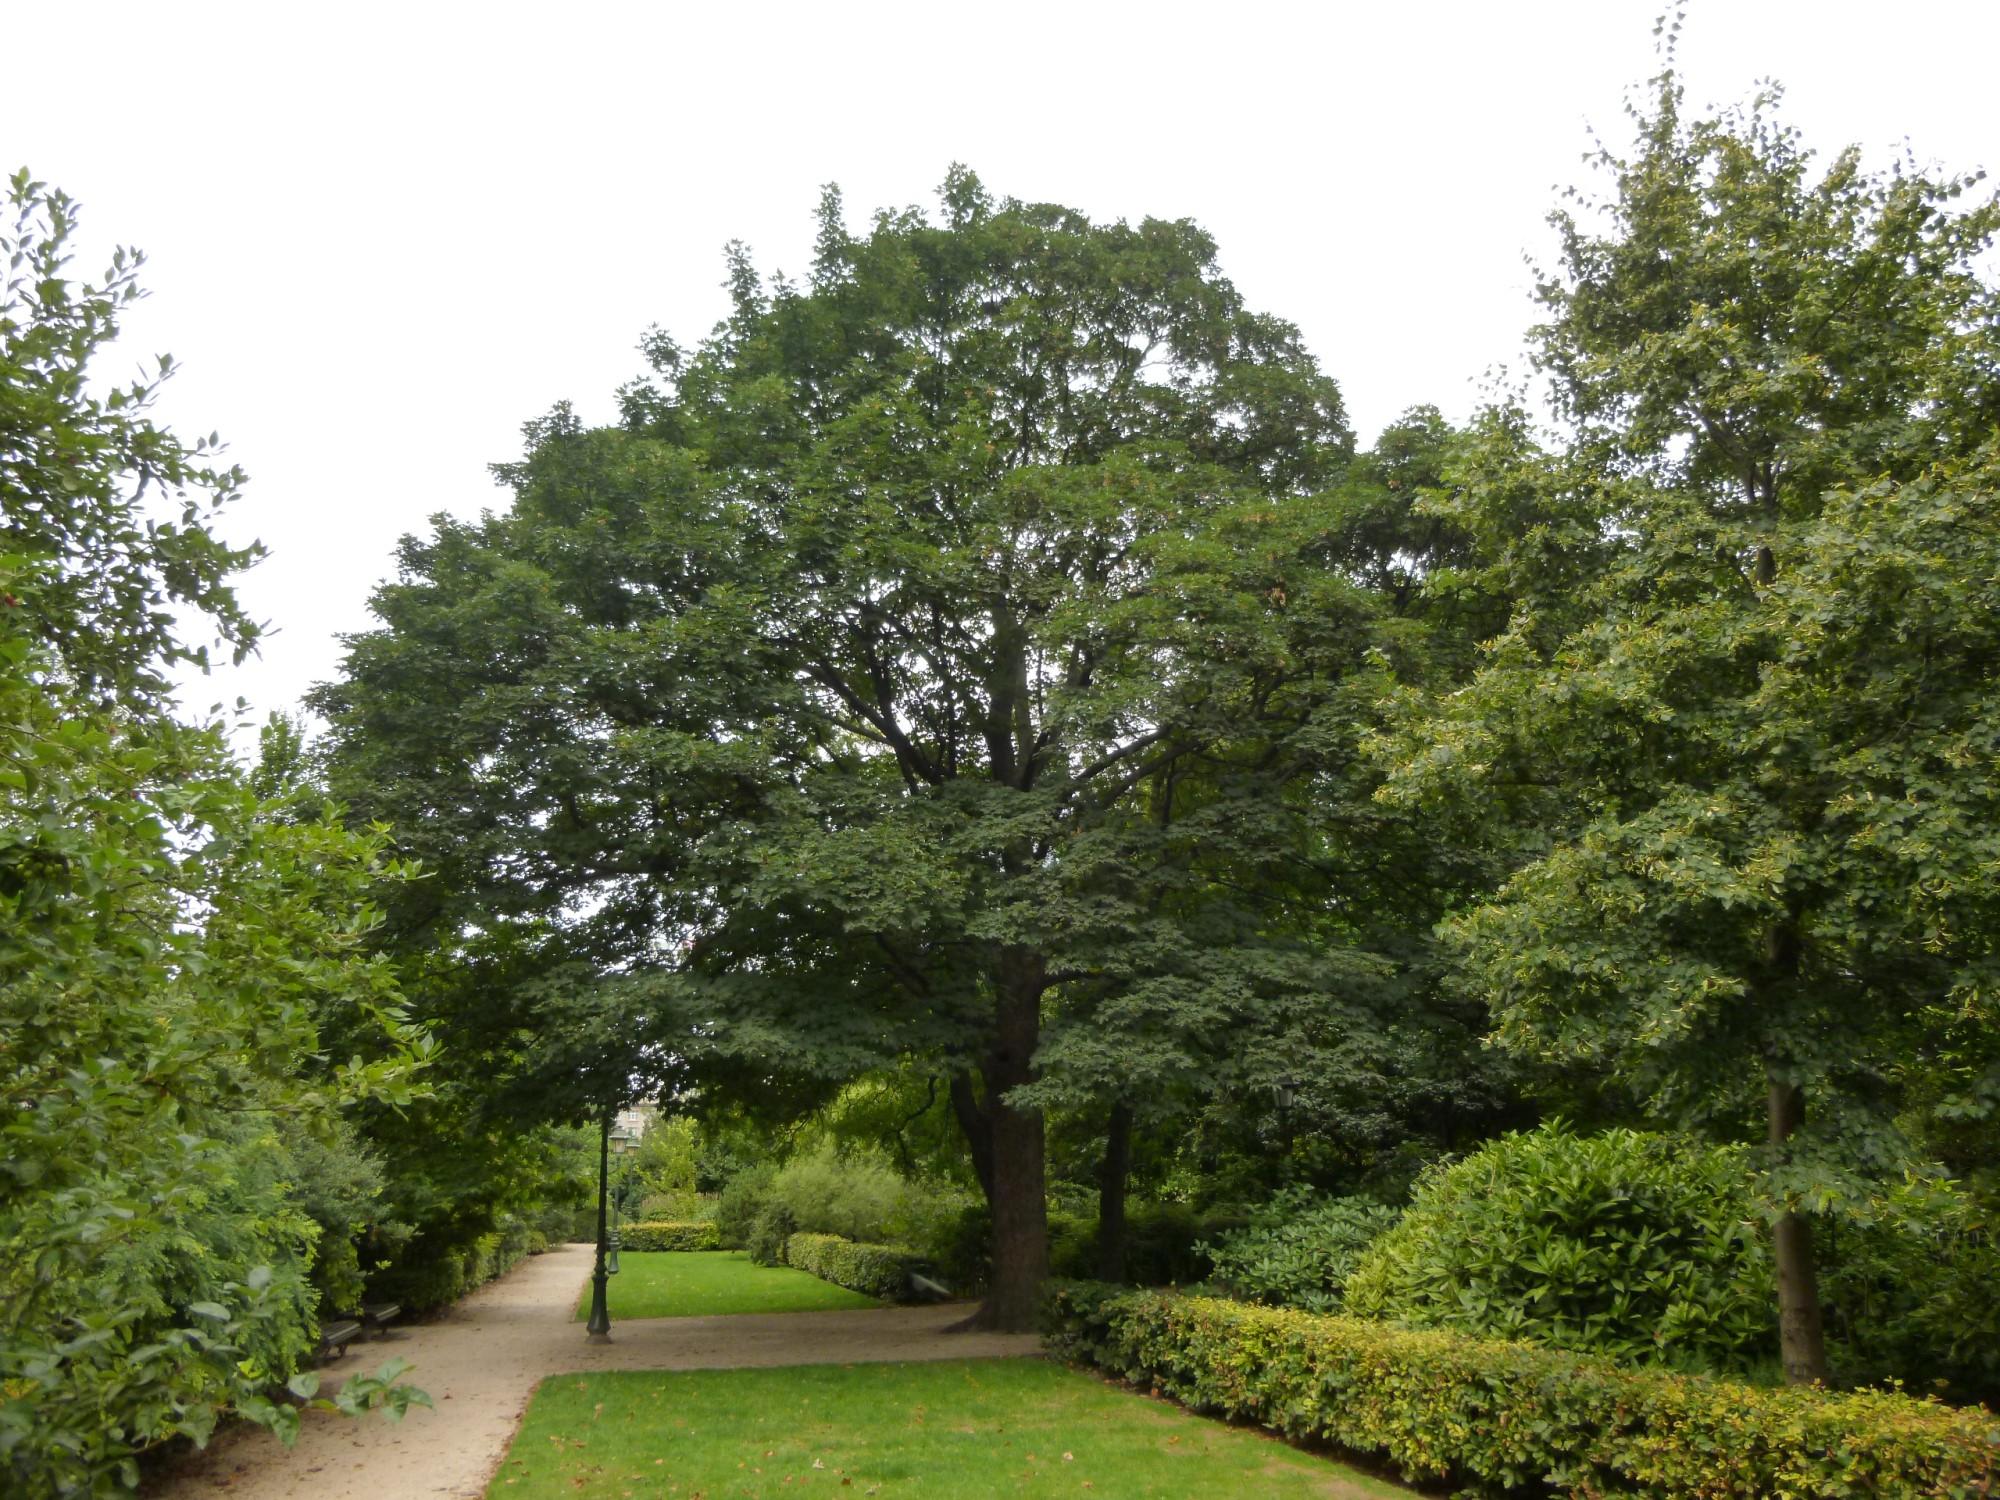 Erable Trautvetter – Saint-Josse-Ten-Noode, Jardin Botanique –  12 Août 2013